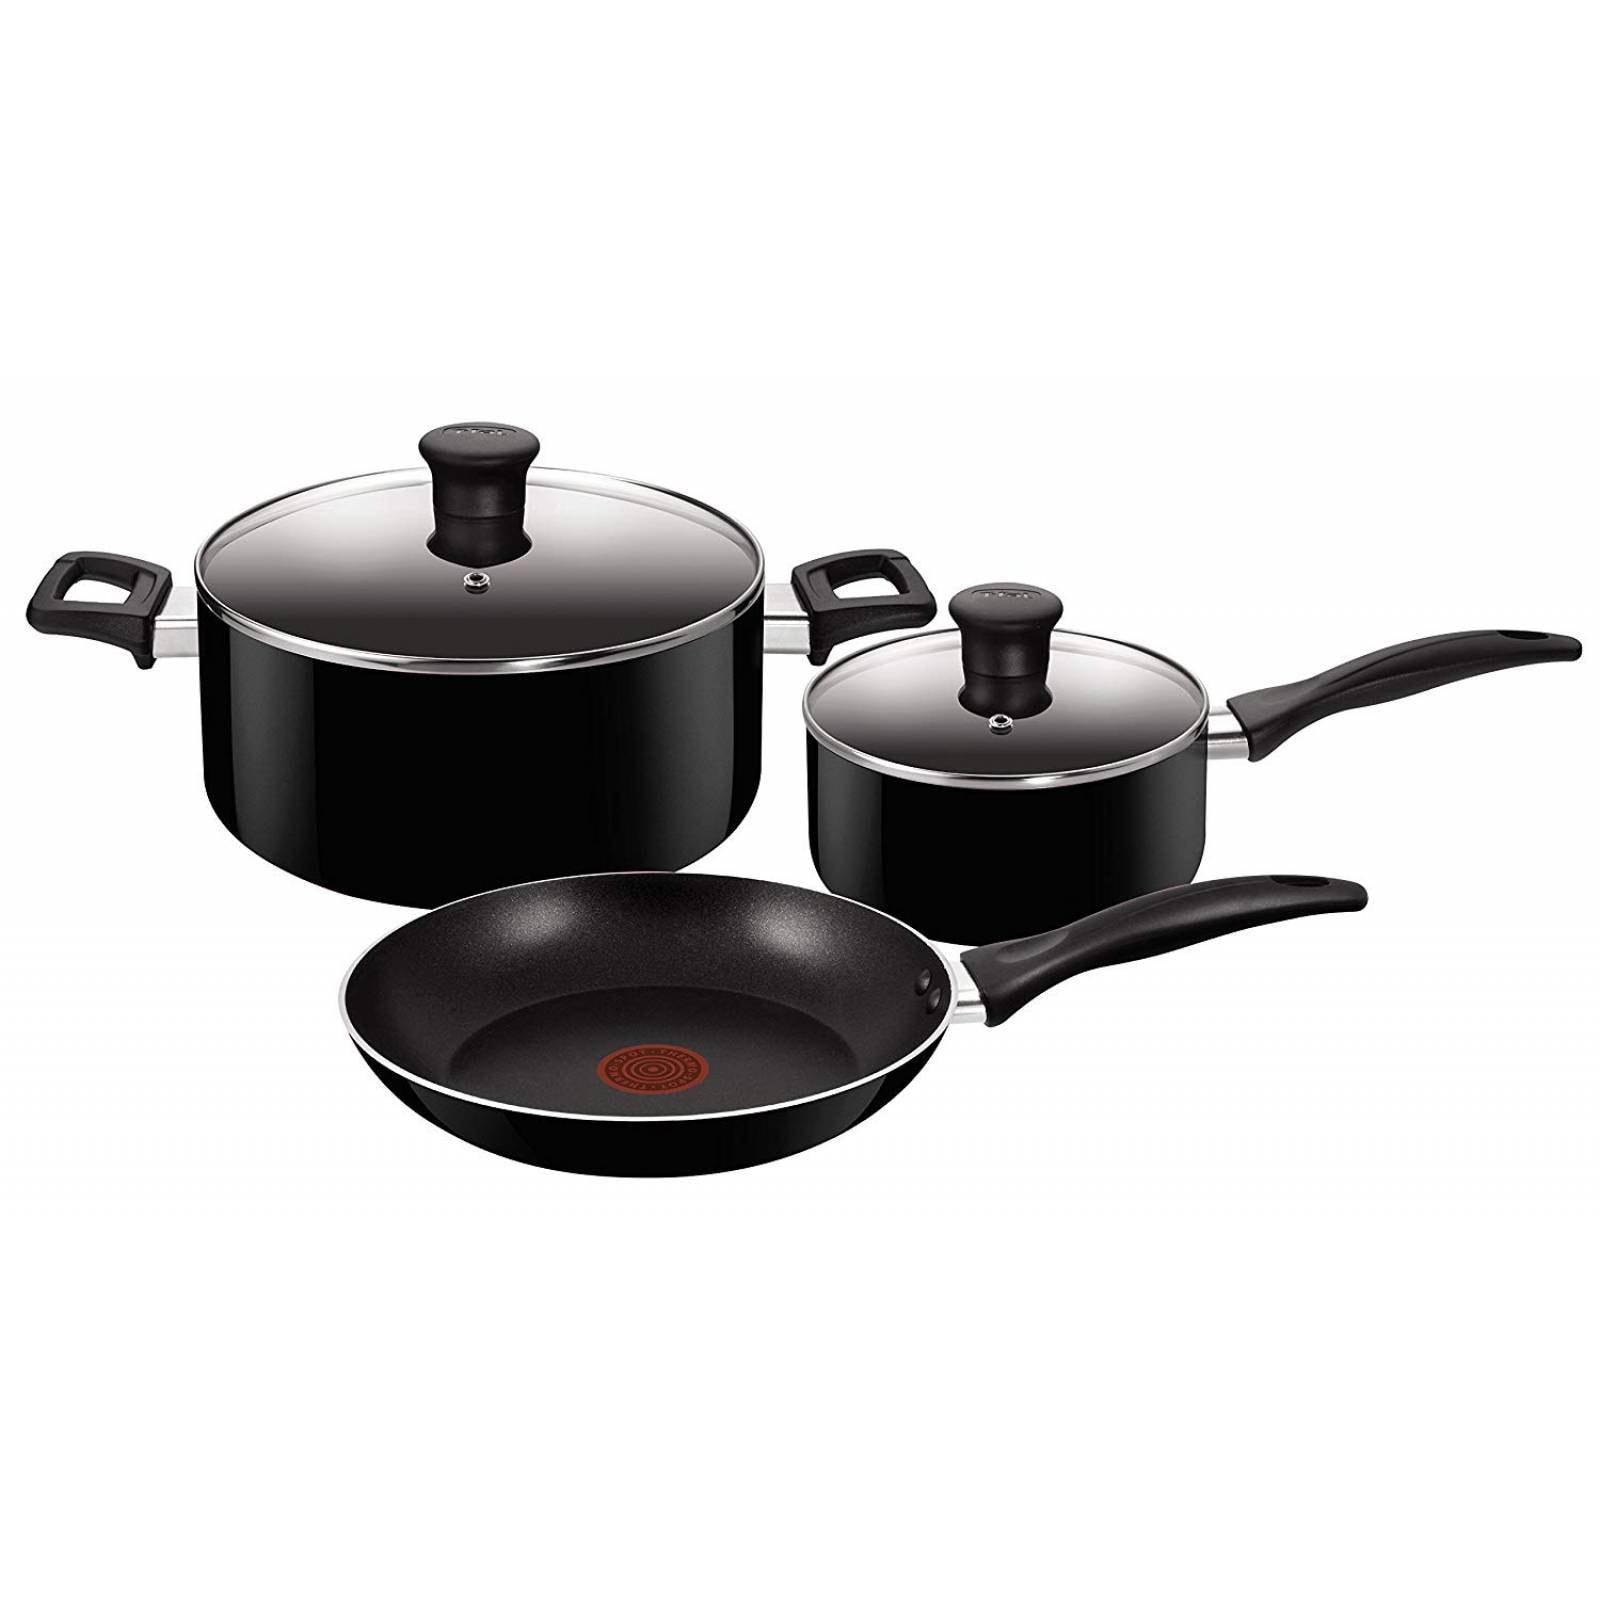 Bateria de Cocina T-Fal Family Cook 5 Piezas